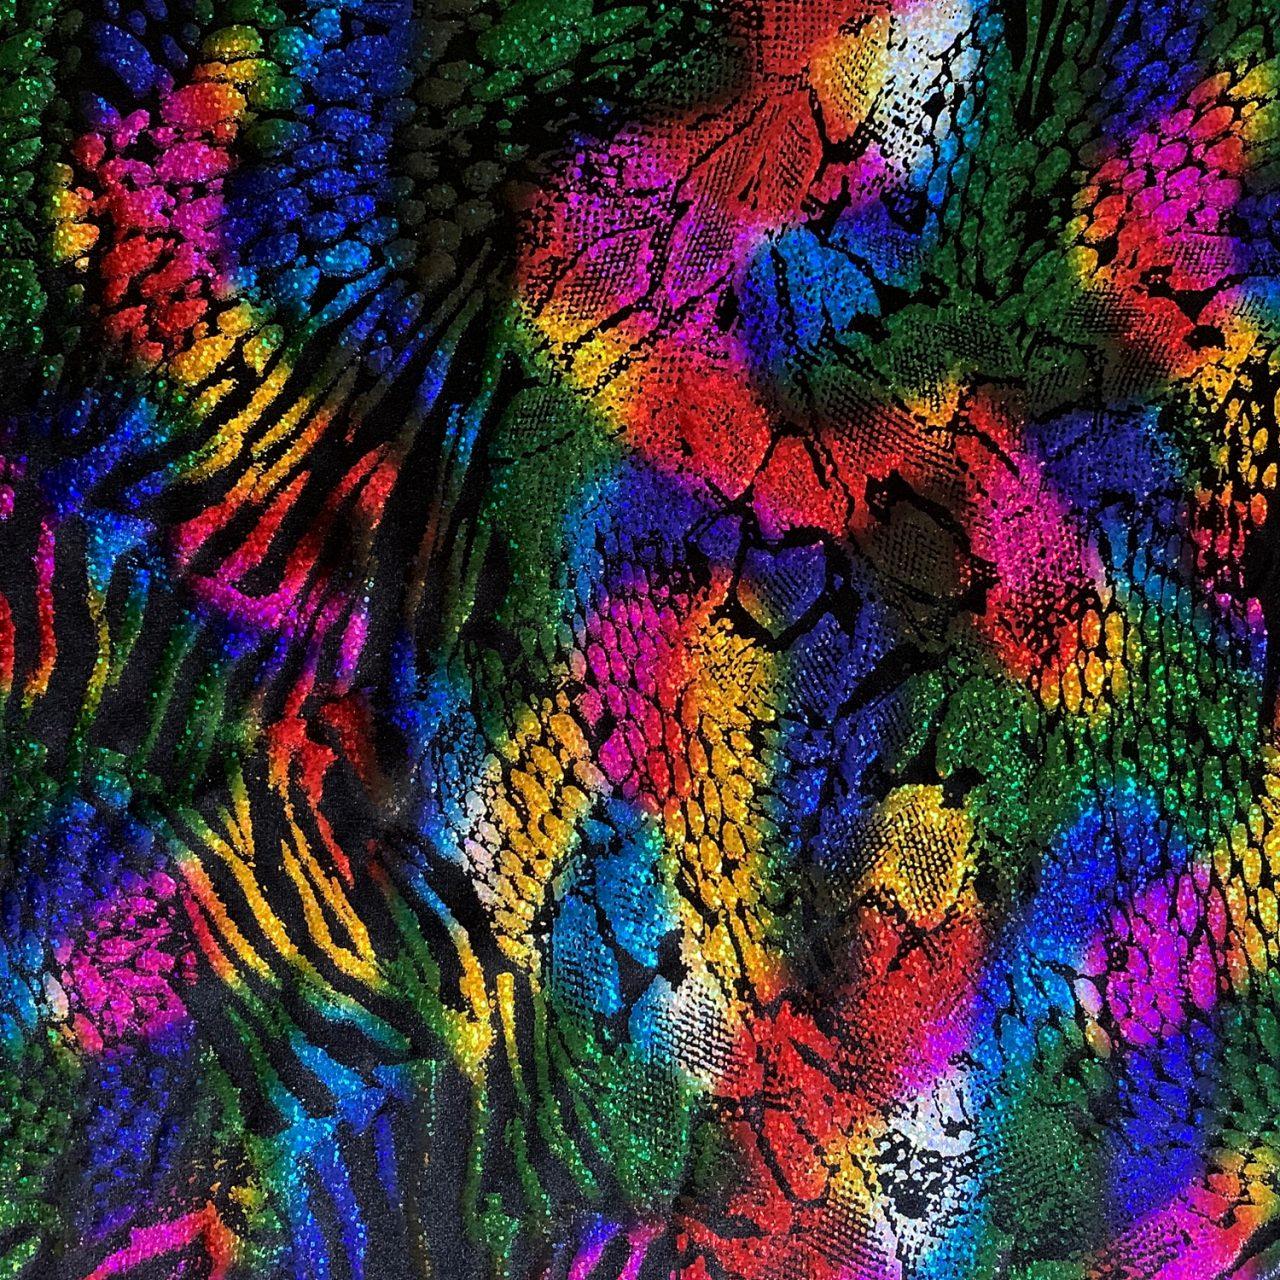 150*100cm Metallic Shiny Stretch Fabric Rainbow Holographic Crafts Creative Made